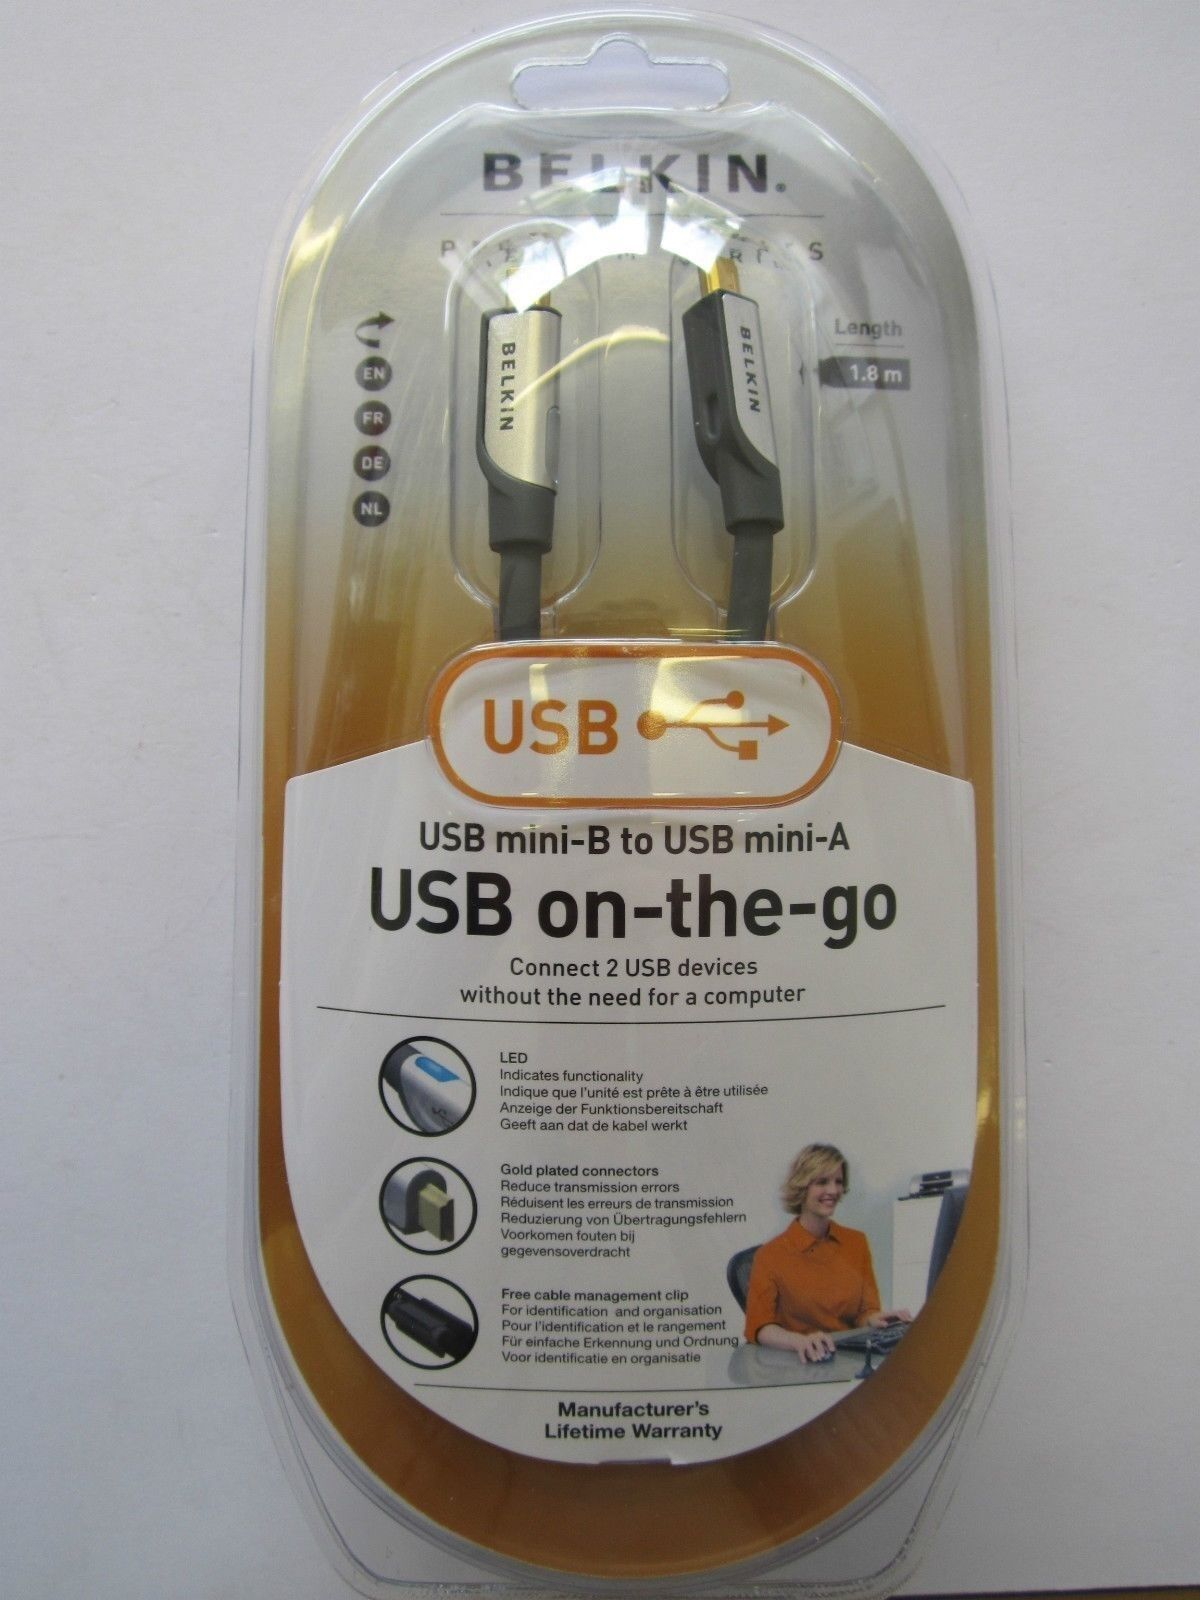 Genuine Original USB Mini-B to USB Mini-A (OTG On the Go) Cable Lead